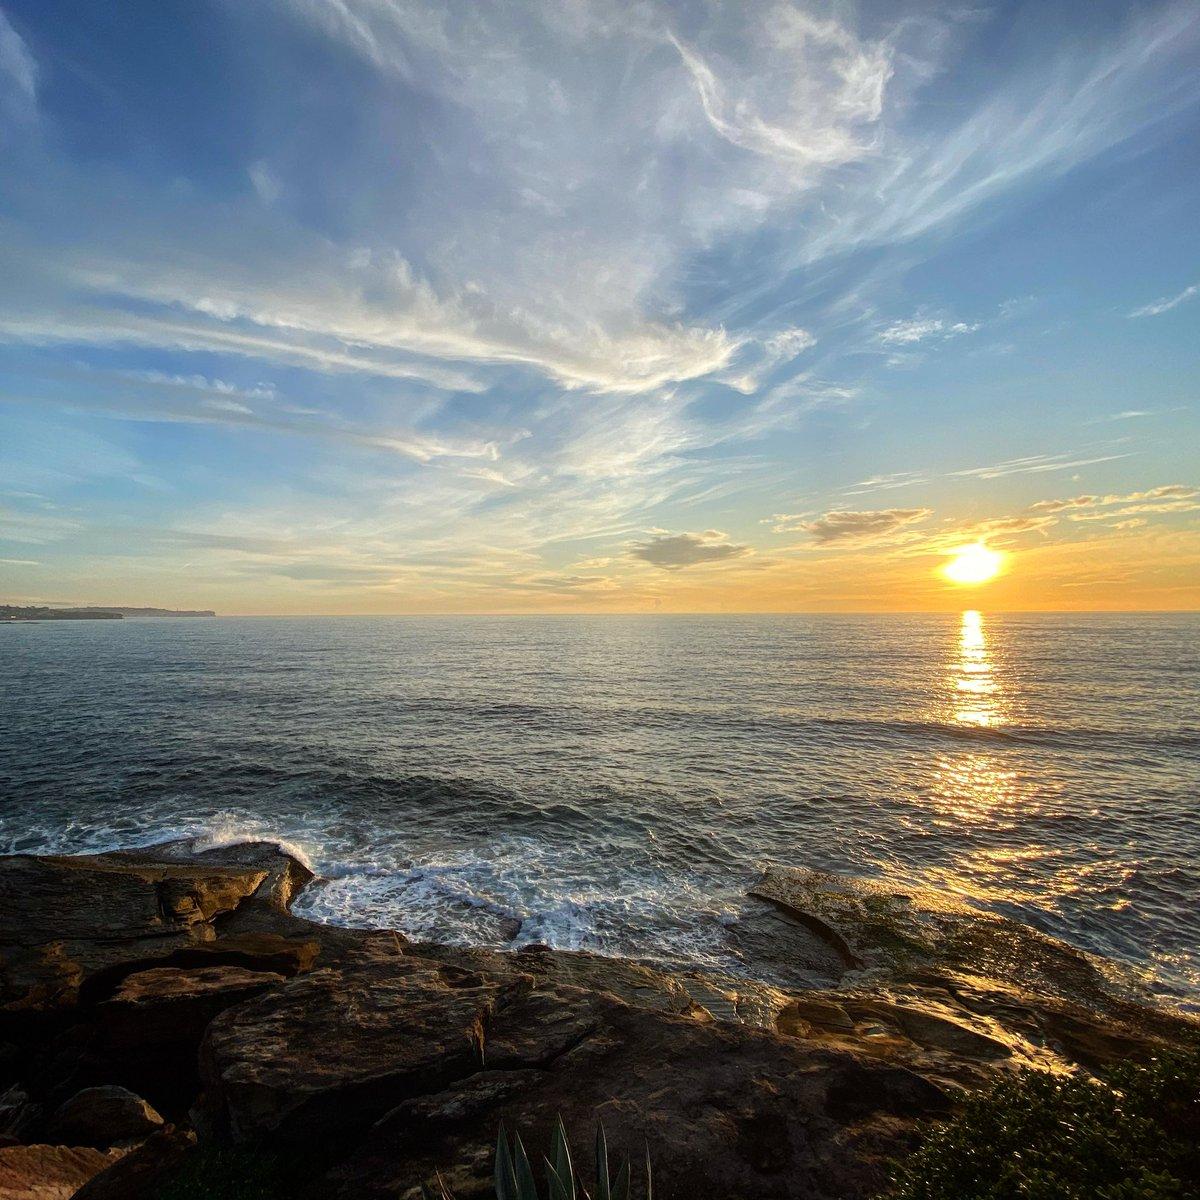 Whispy Friday. #sydney #coastpic.twitter.com/GmfJ7pDiTx